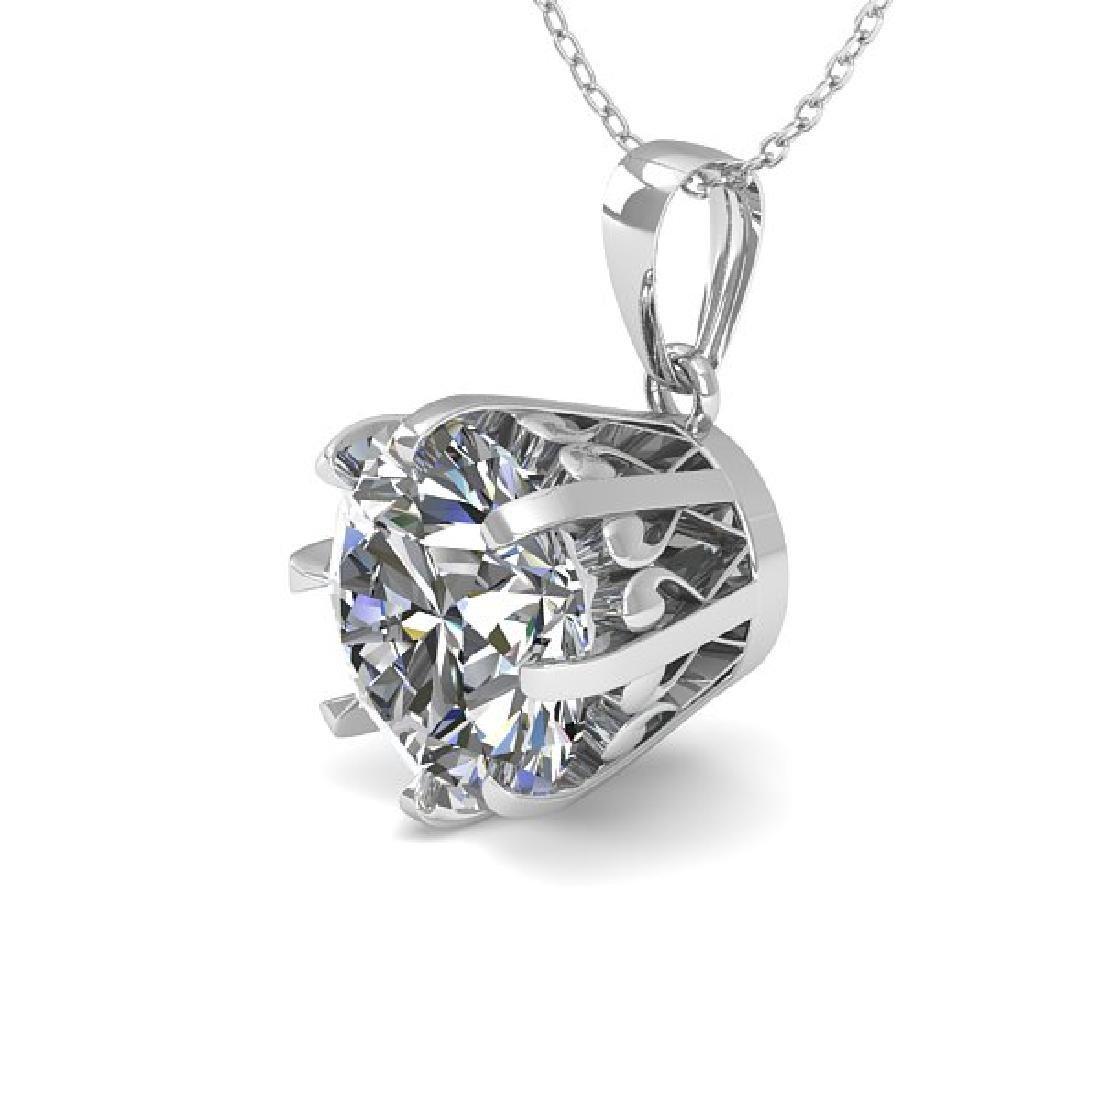 1 CTW VS/SI Diamond Solitaire Necklace 14K White Gold